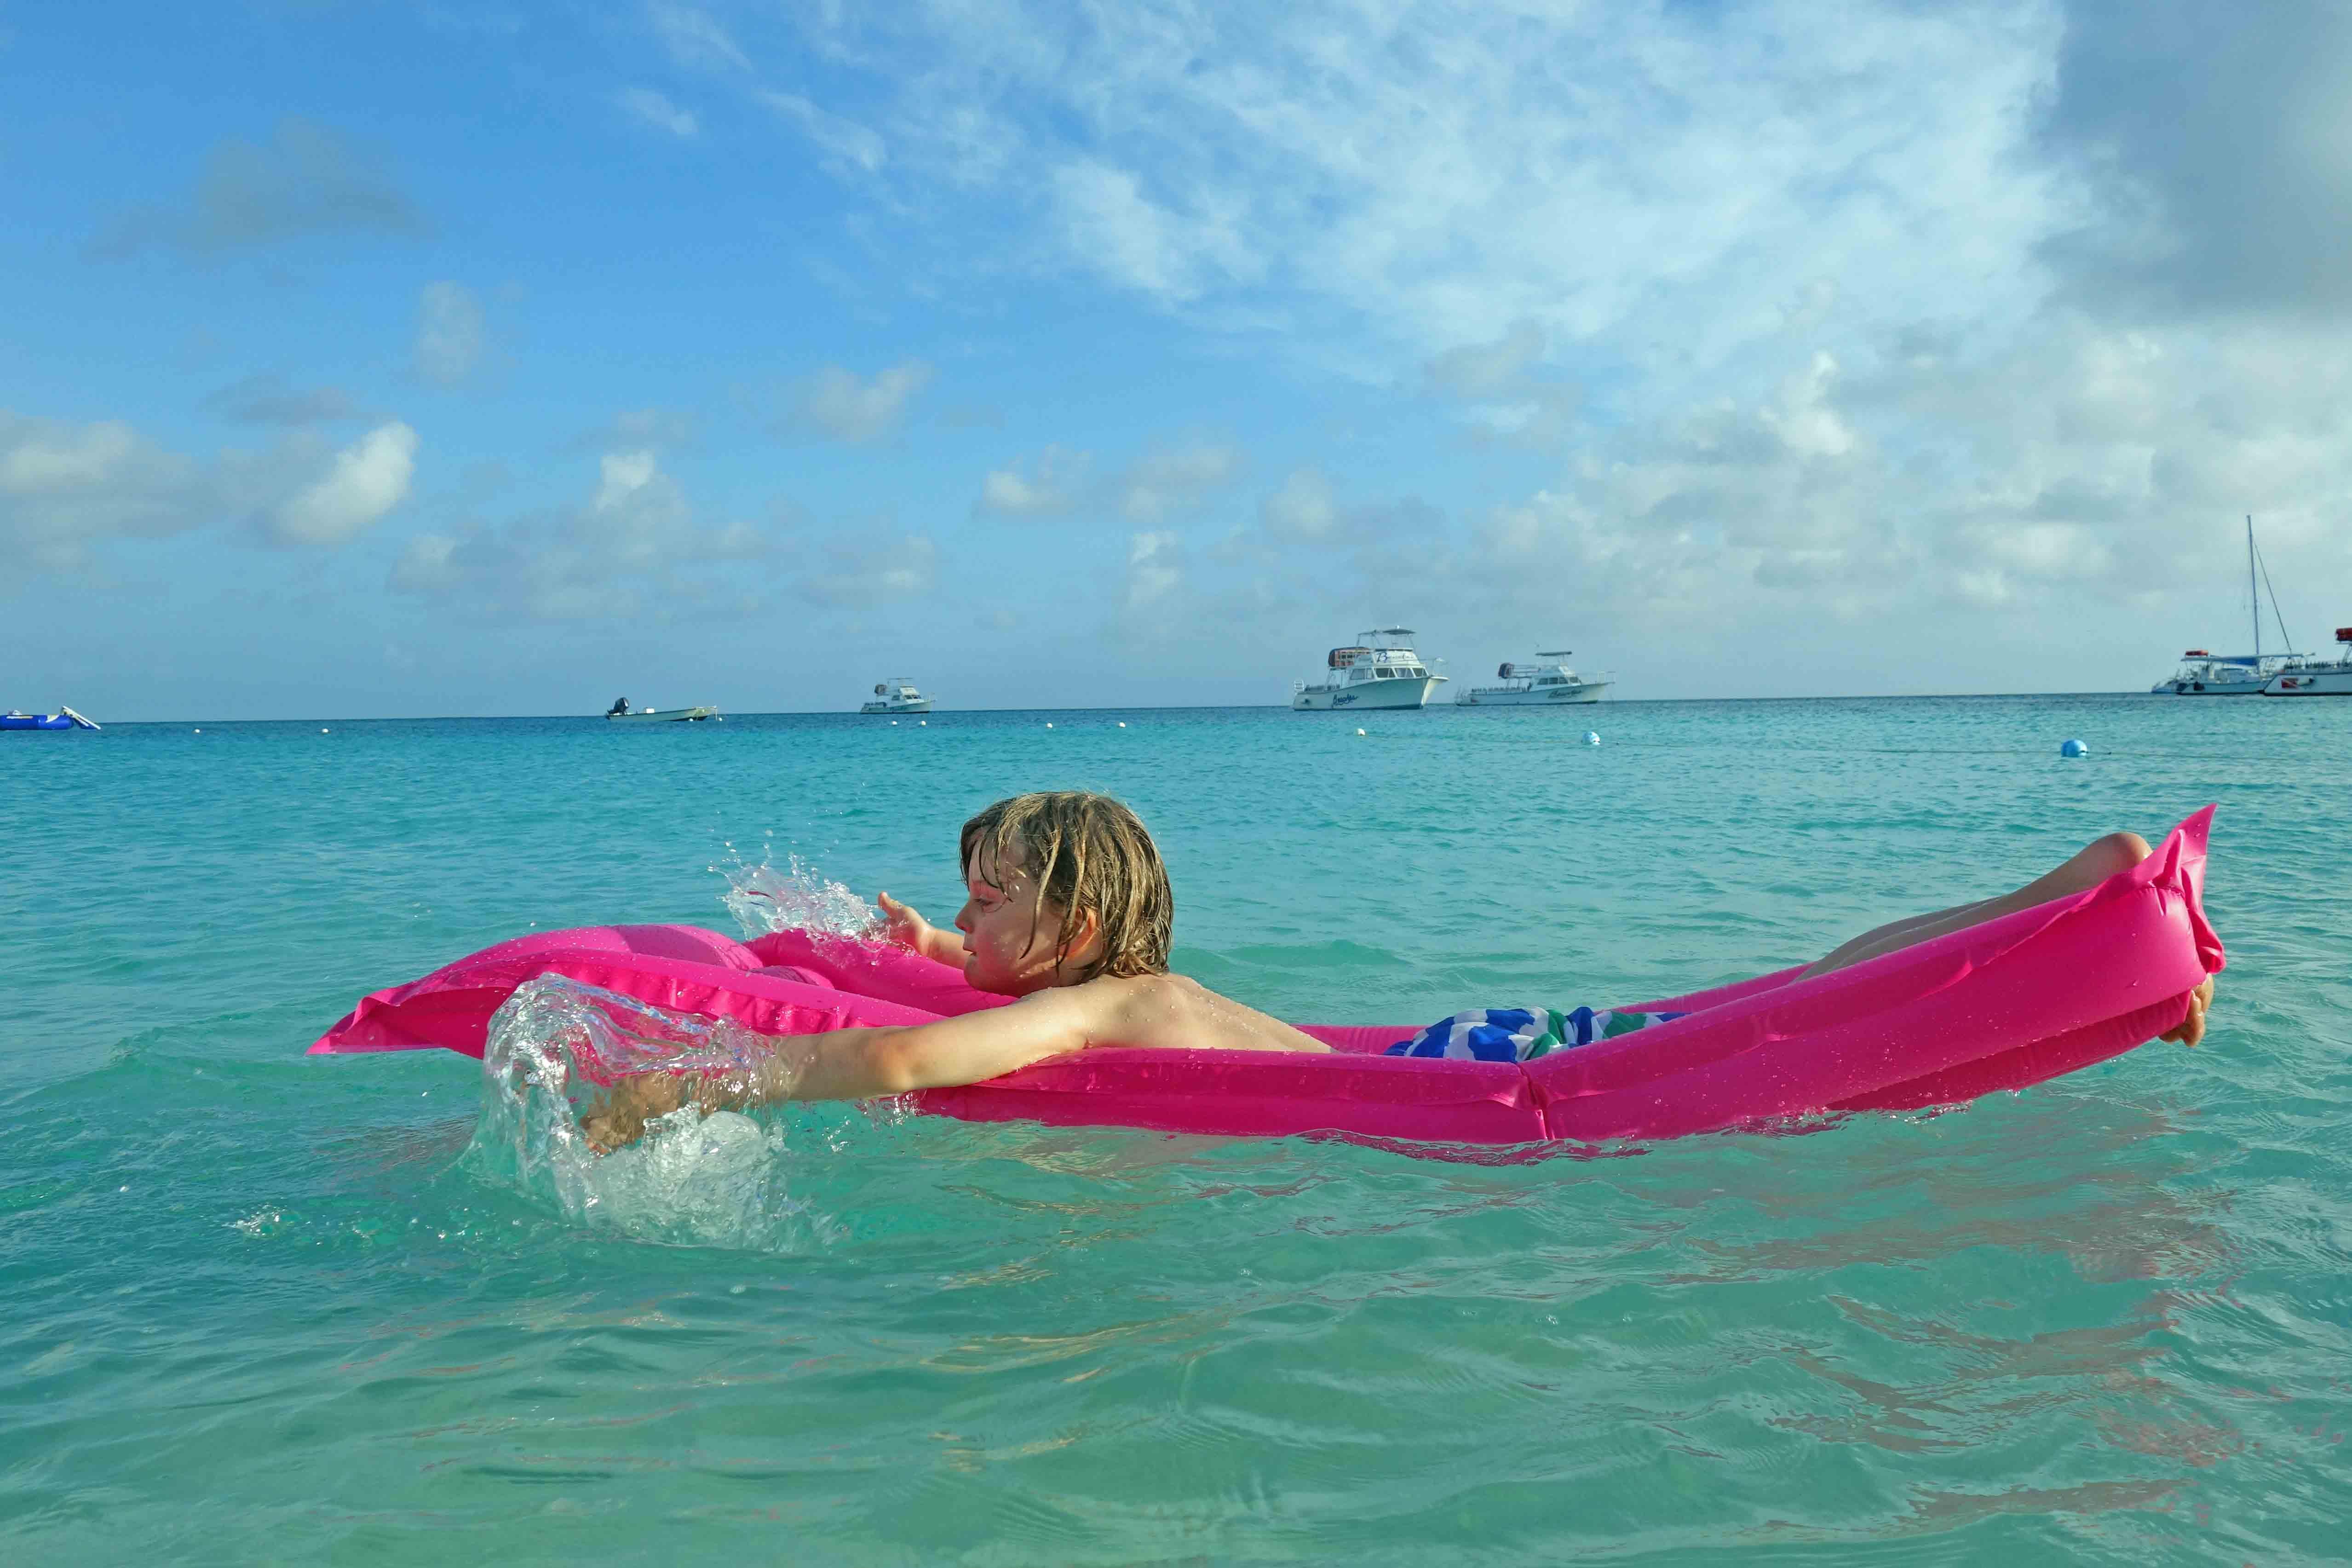 karibik beaches auf den turks caicos inseln. Black Bedroom Furniture Sets. Home Design Ideas